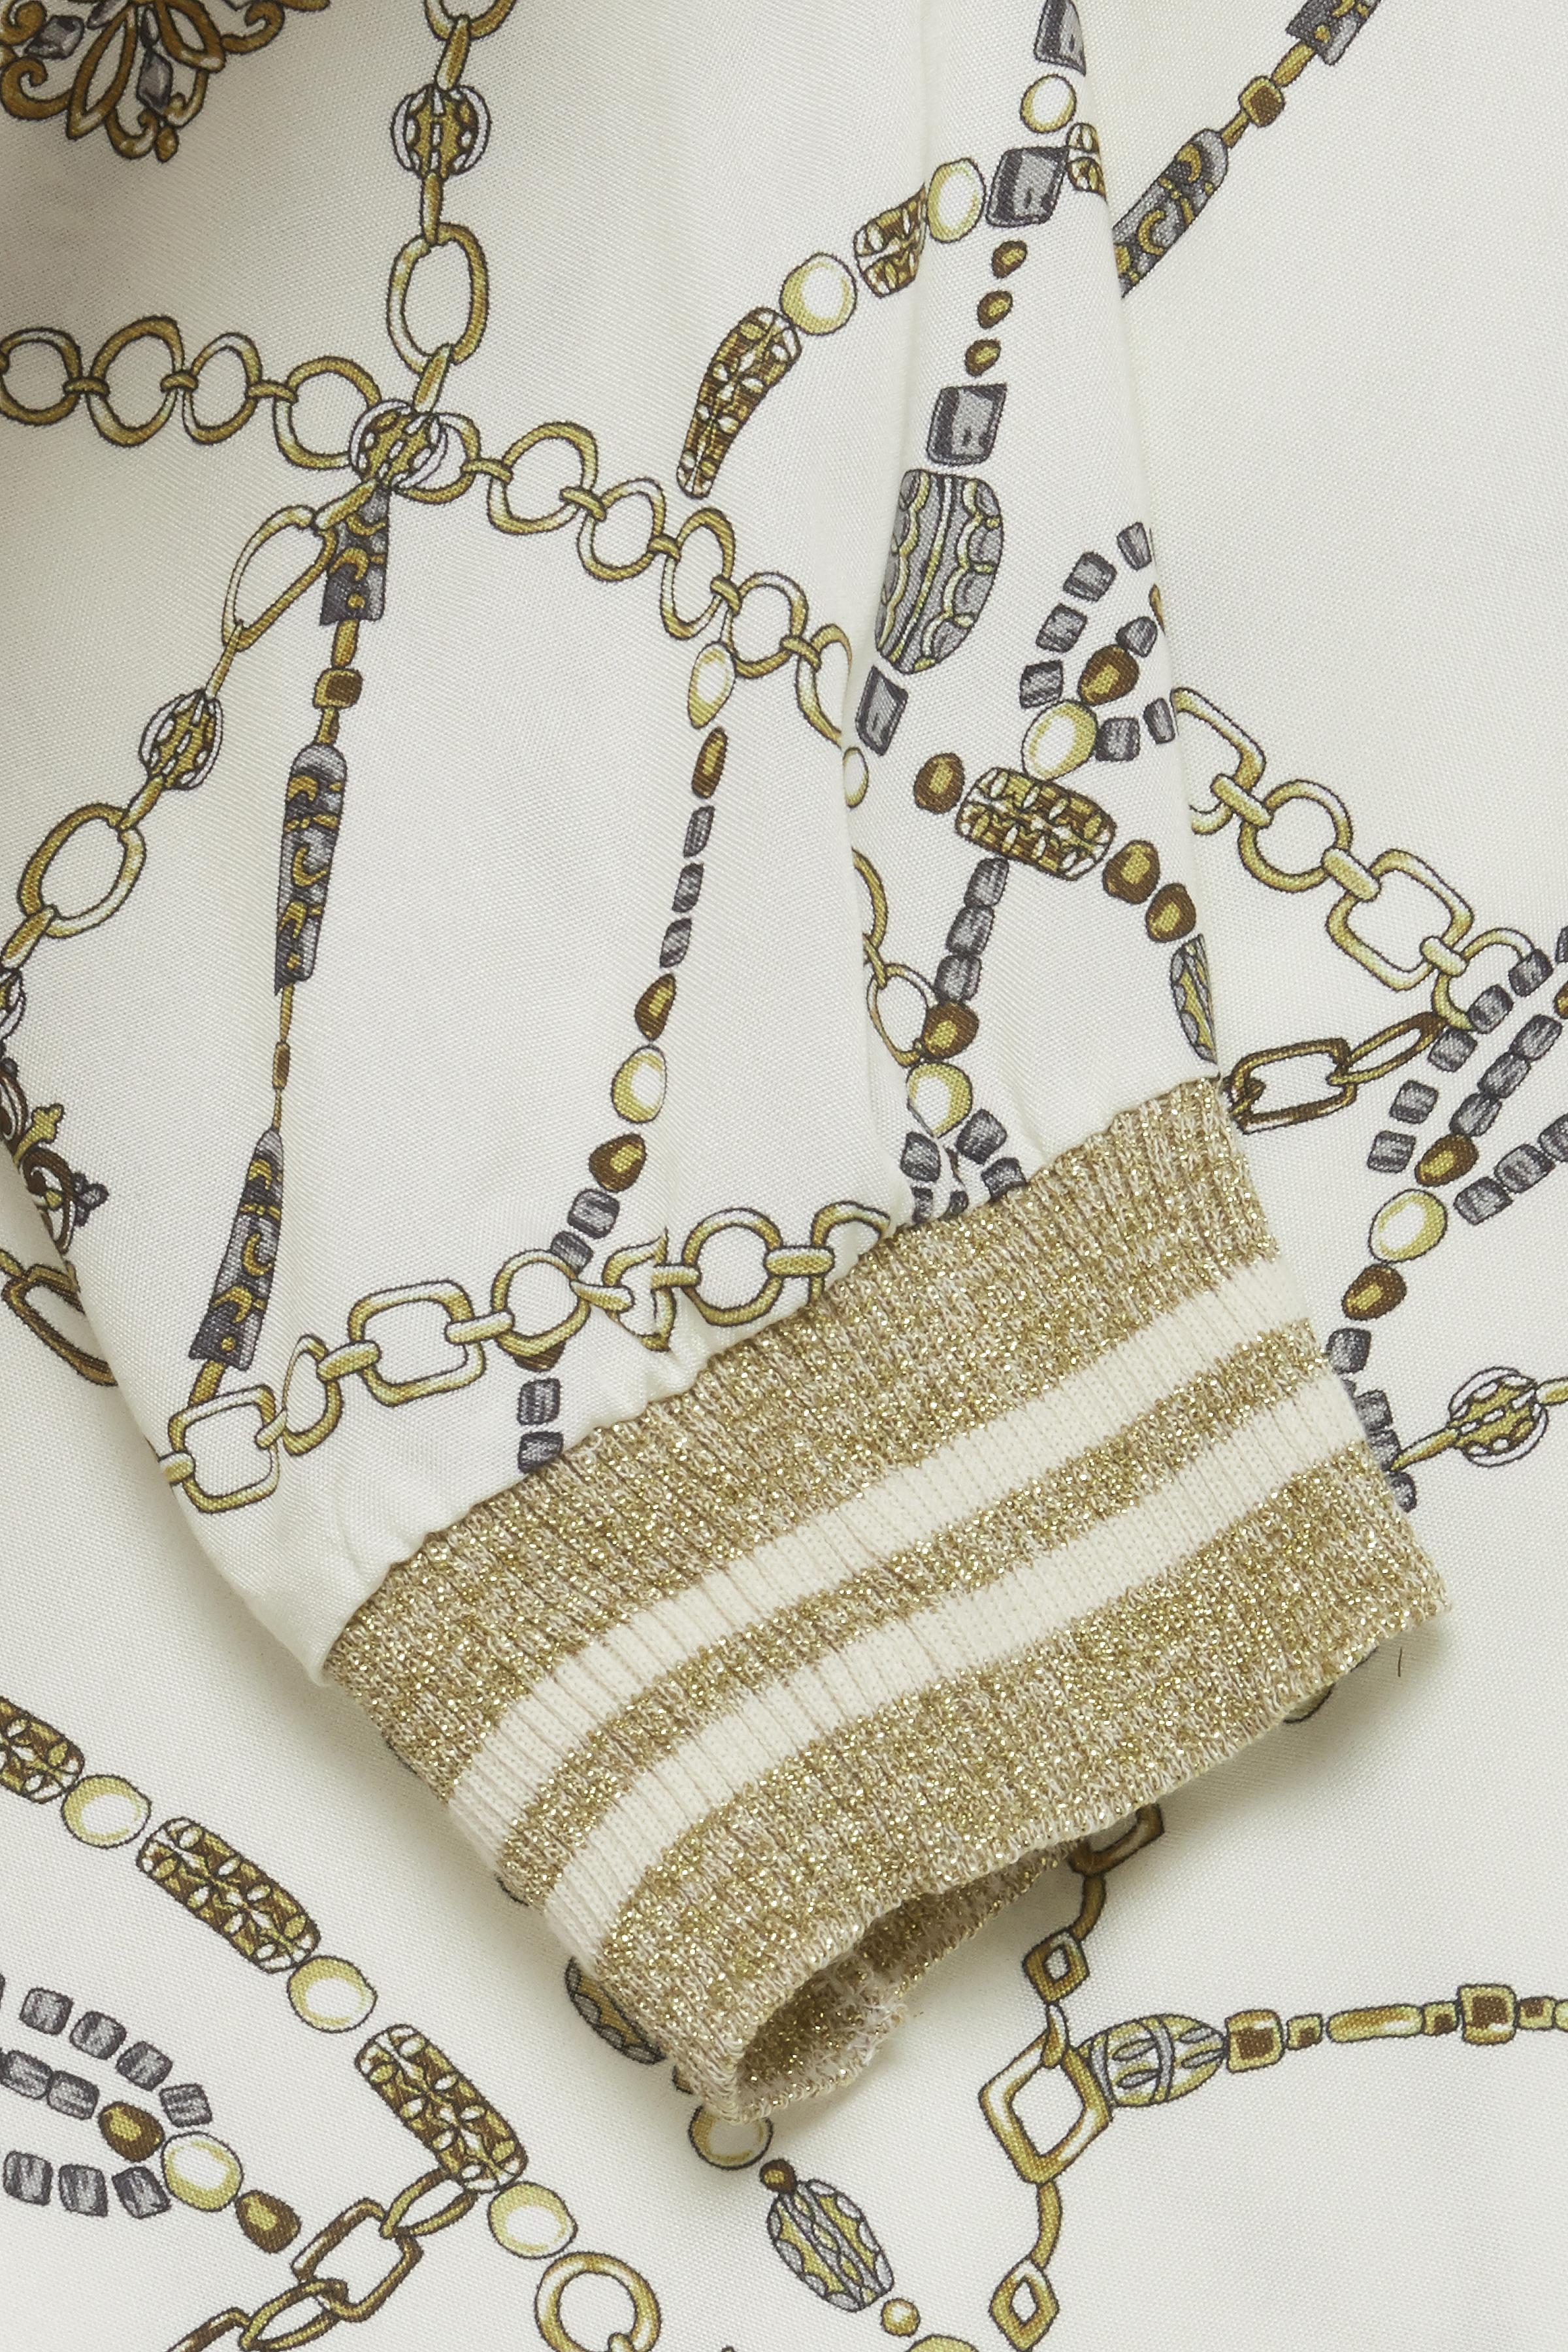 Off-white/goud Blouse met lange mouwen van b.young – Door Off-white/goud Blouse met lange mouwen van maat. 34-46 hier